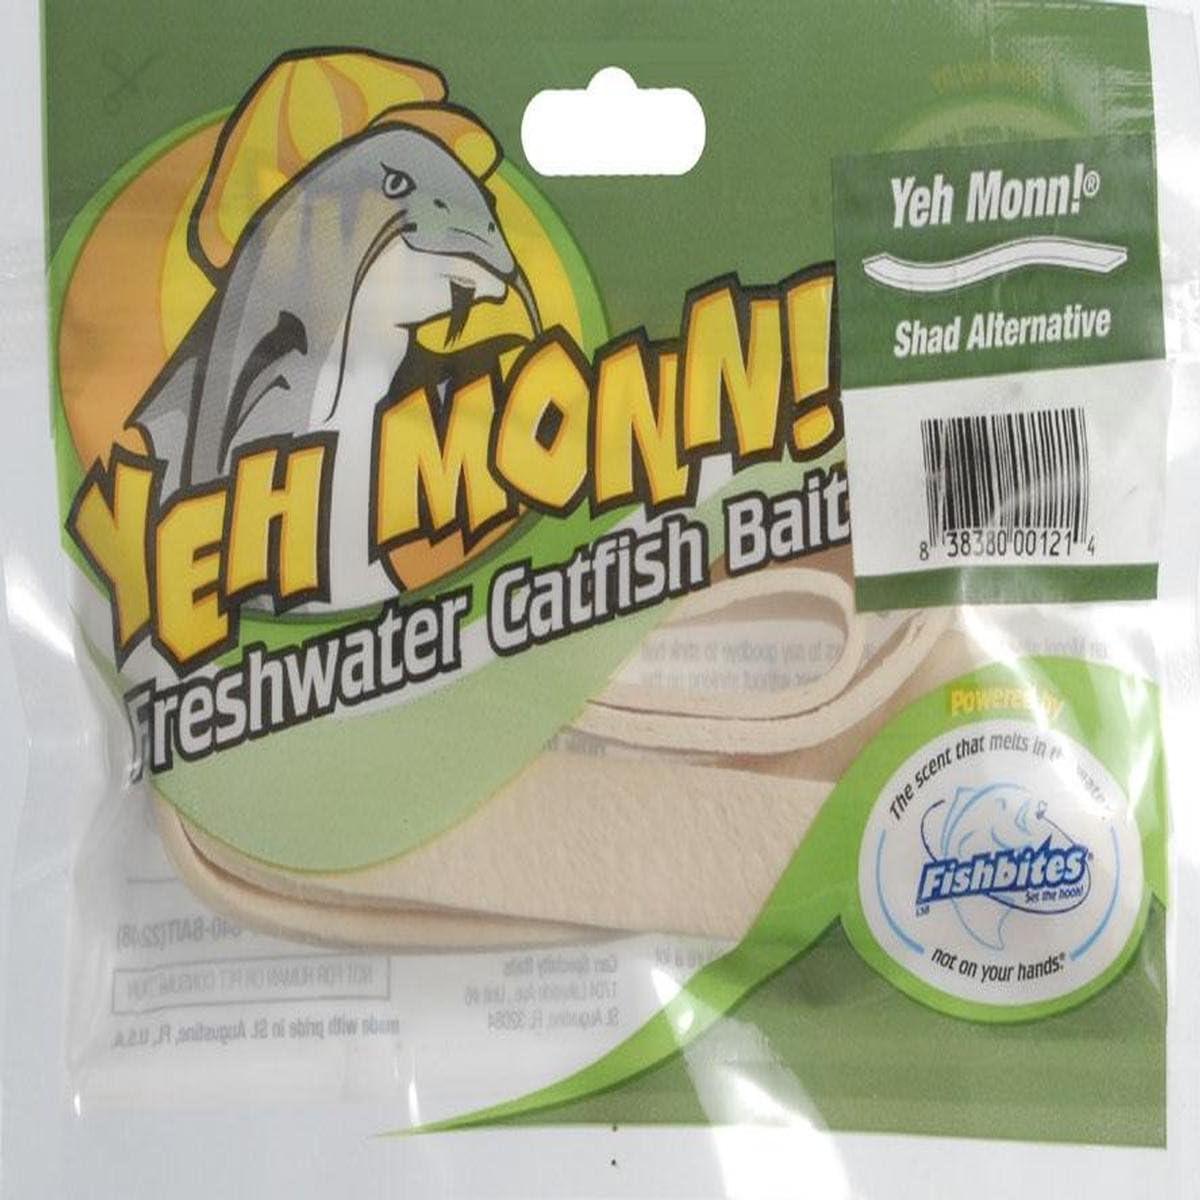 Fishbites 0121 Yeh Monn Freshwater Catfish Bait, Shad Worm and Flesh